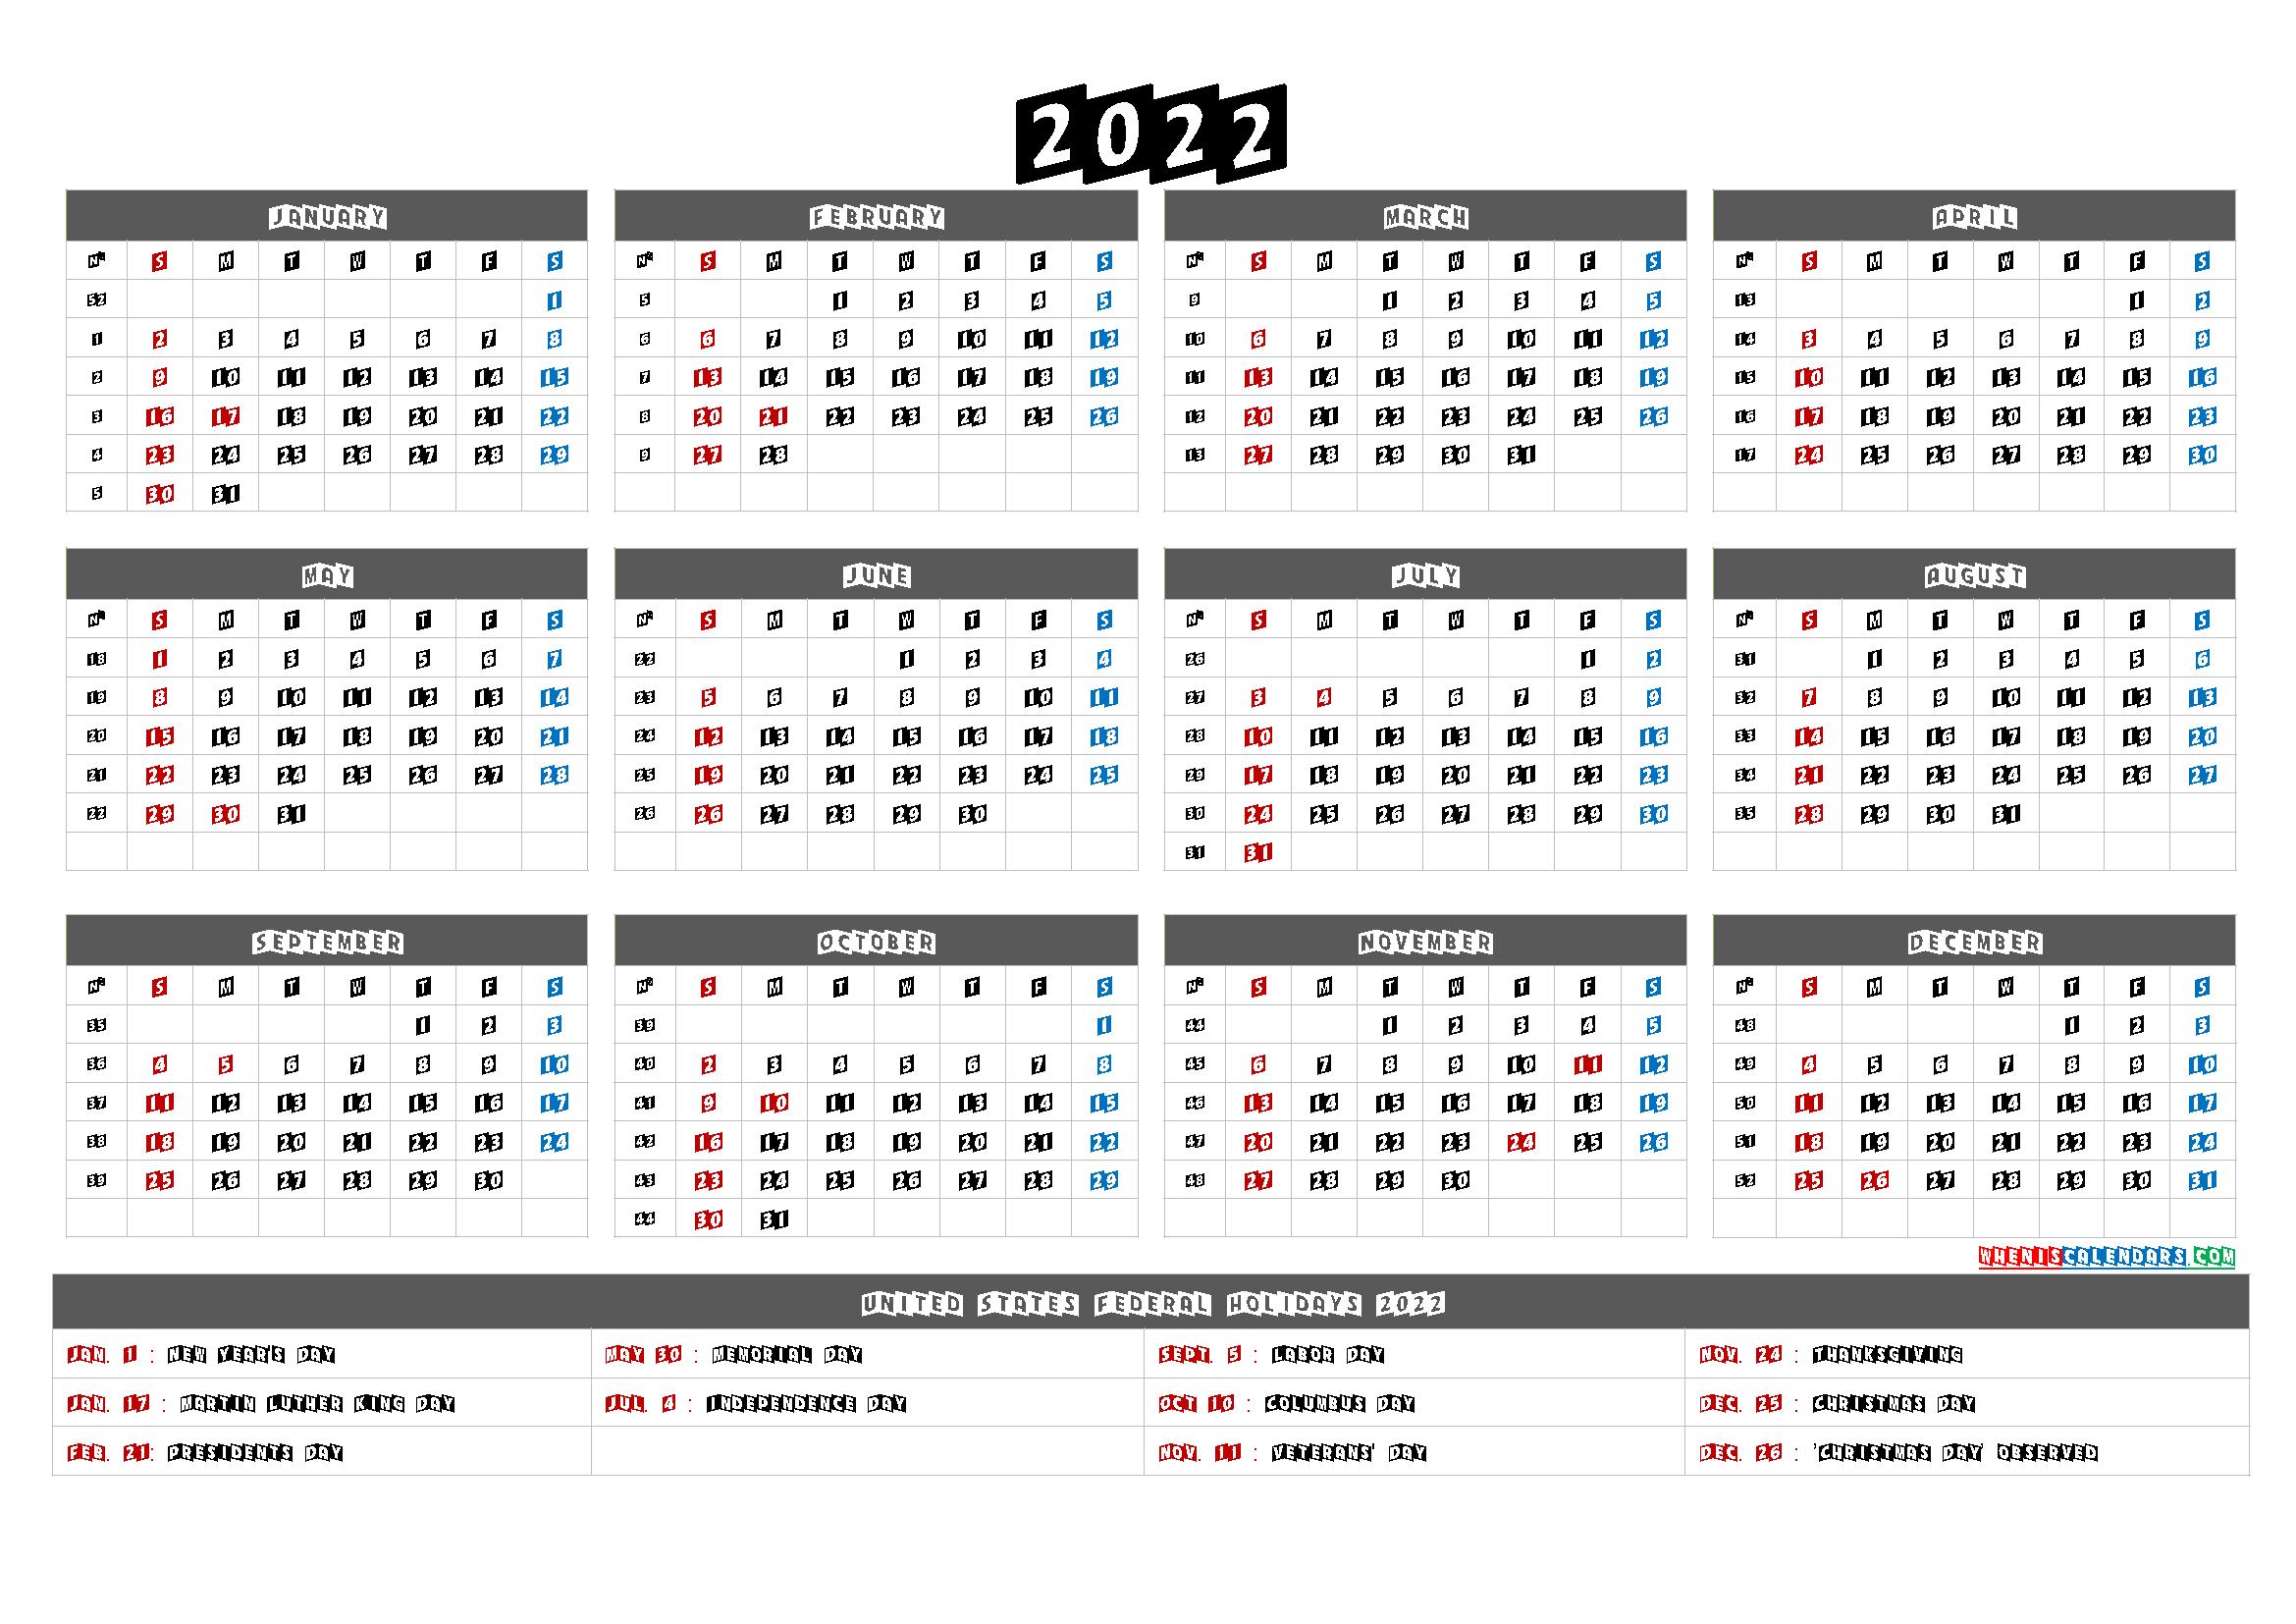 20+ Calendar For 2022 Printable - Free Download Printable ...